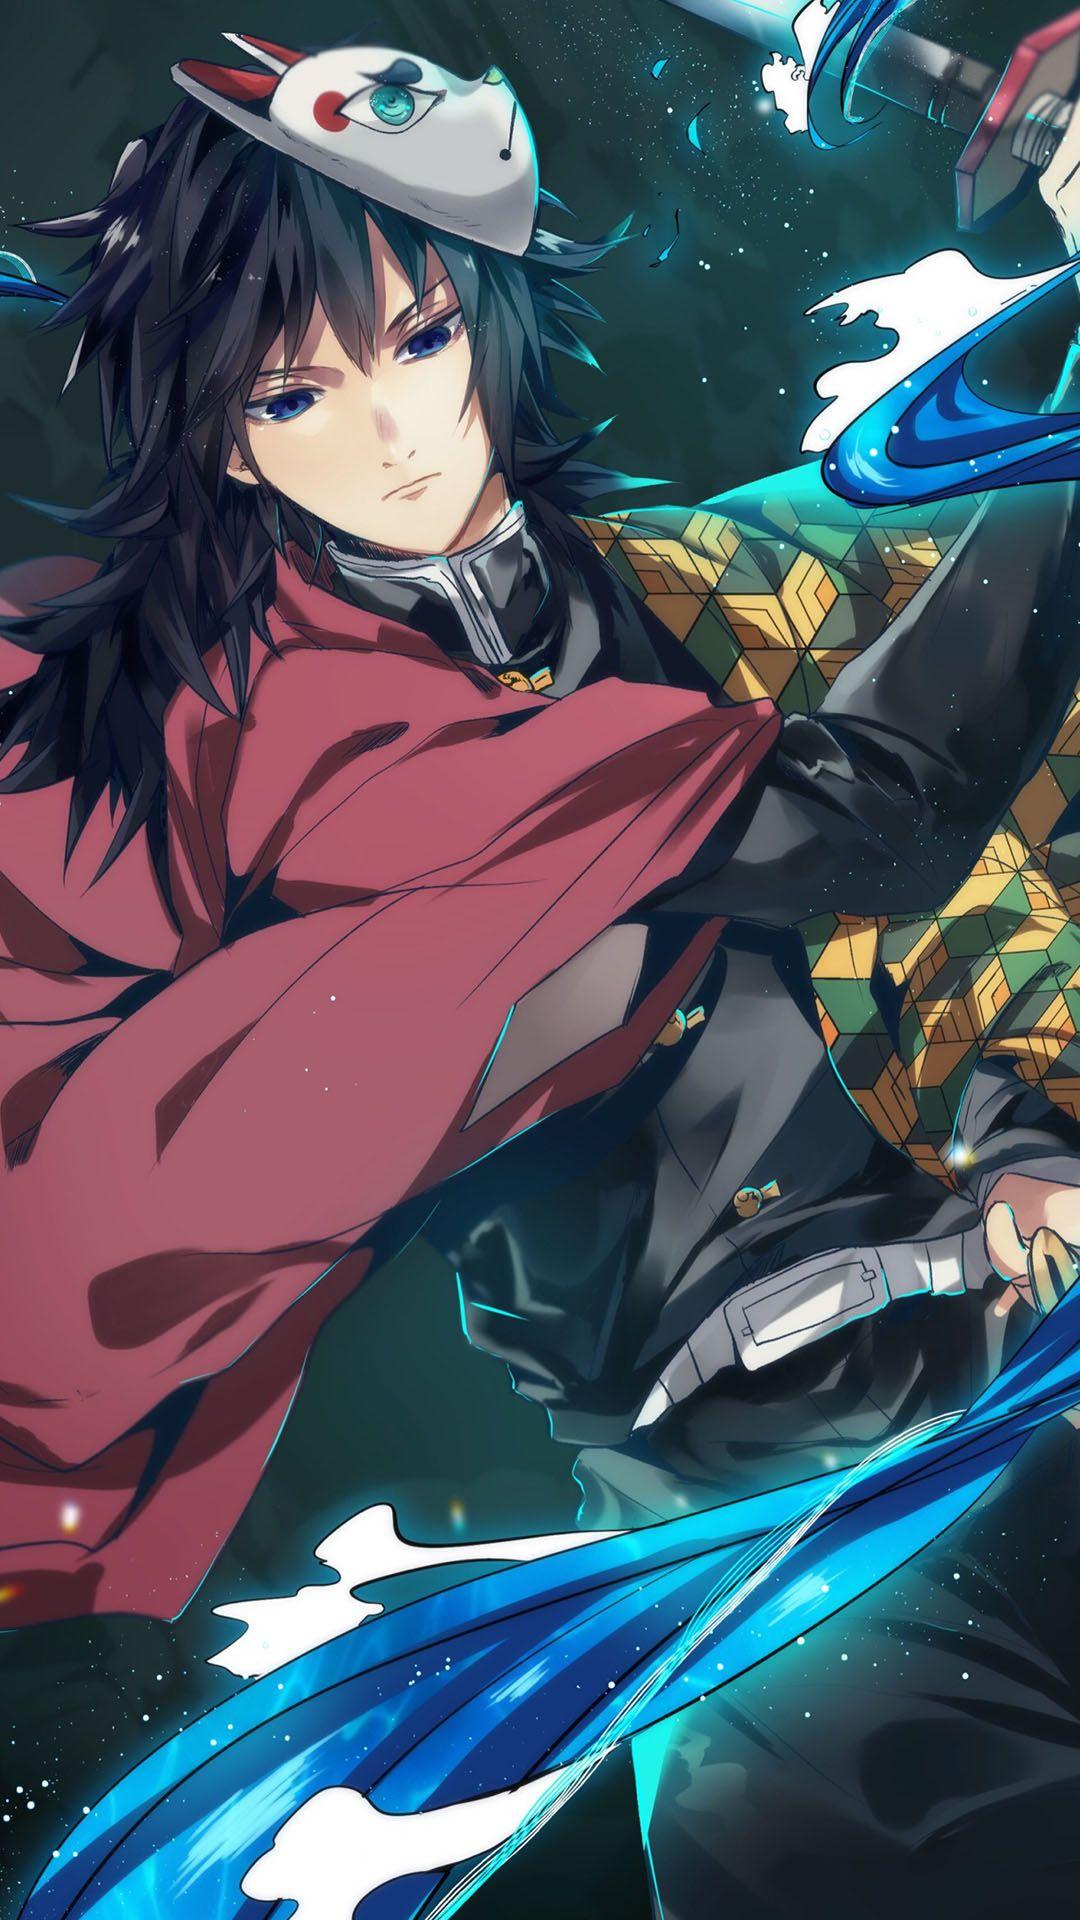 Anime Wallpaper Hd For Mobile 1080x1920 Download Hd Wallpaper Wallpapertip